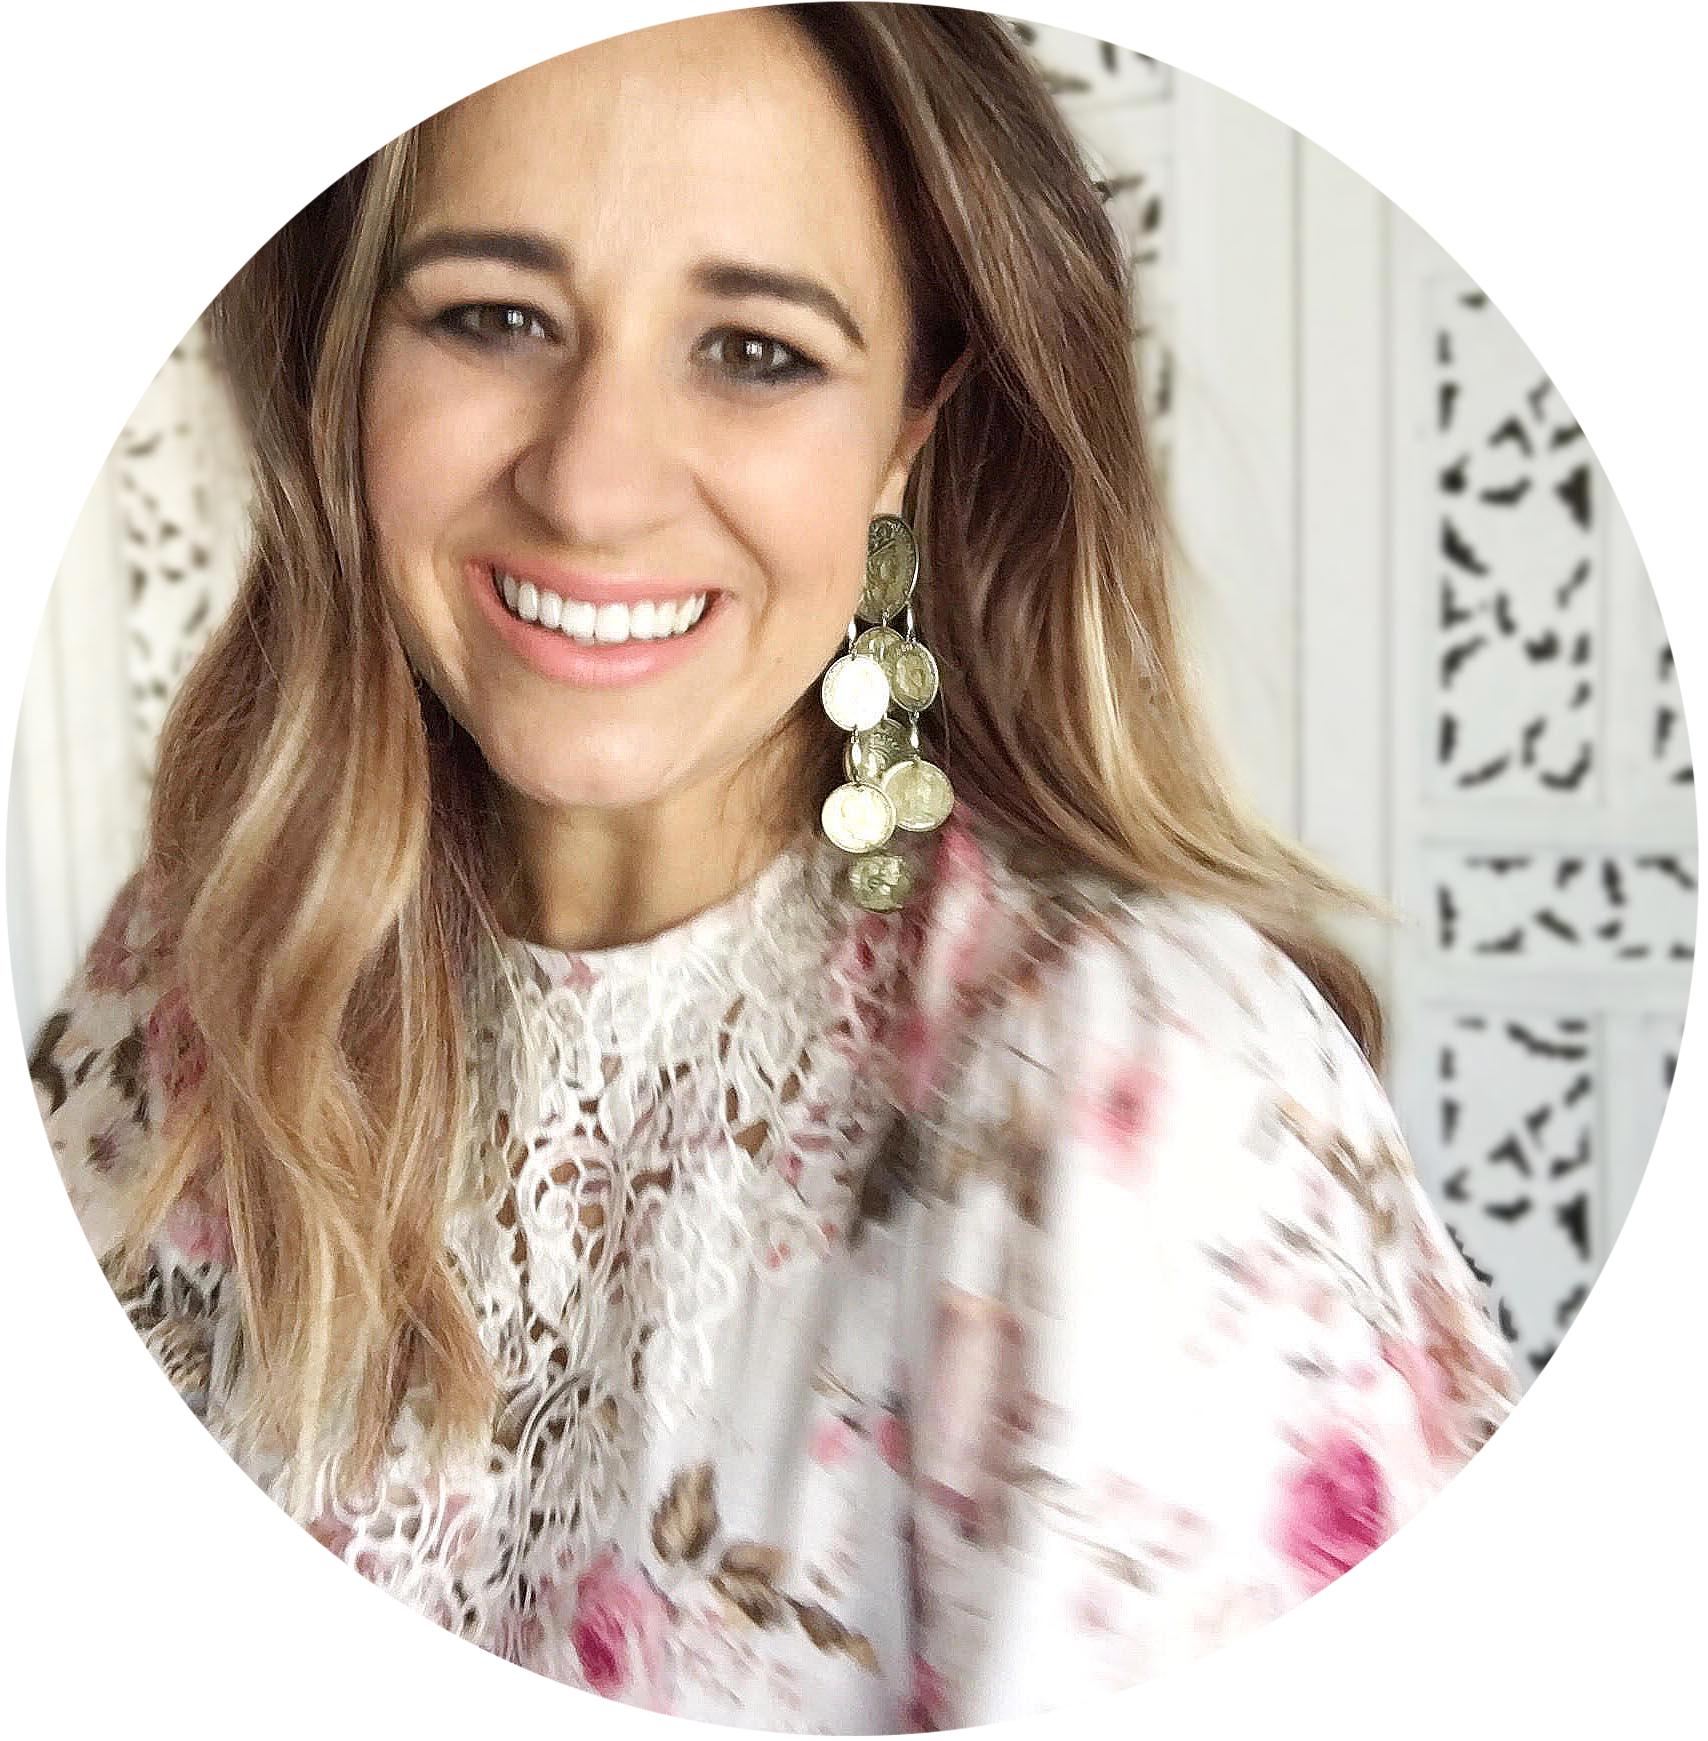 Clarissa grace waking up in paris personal style online coaching mum entrepreneur